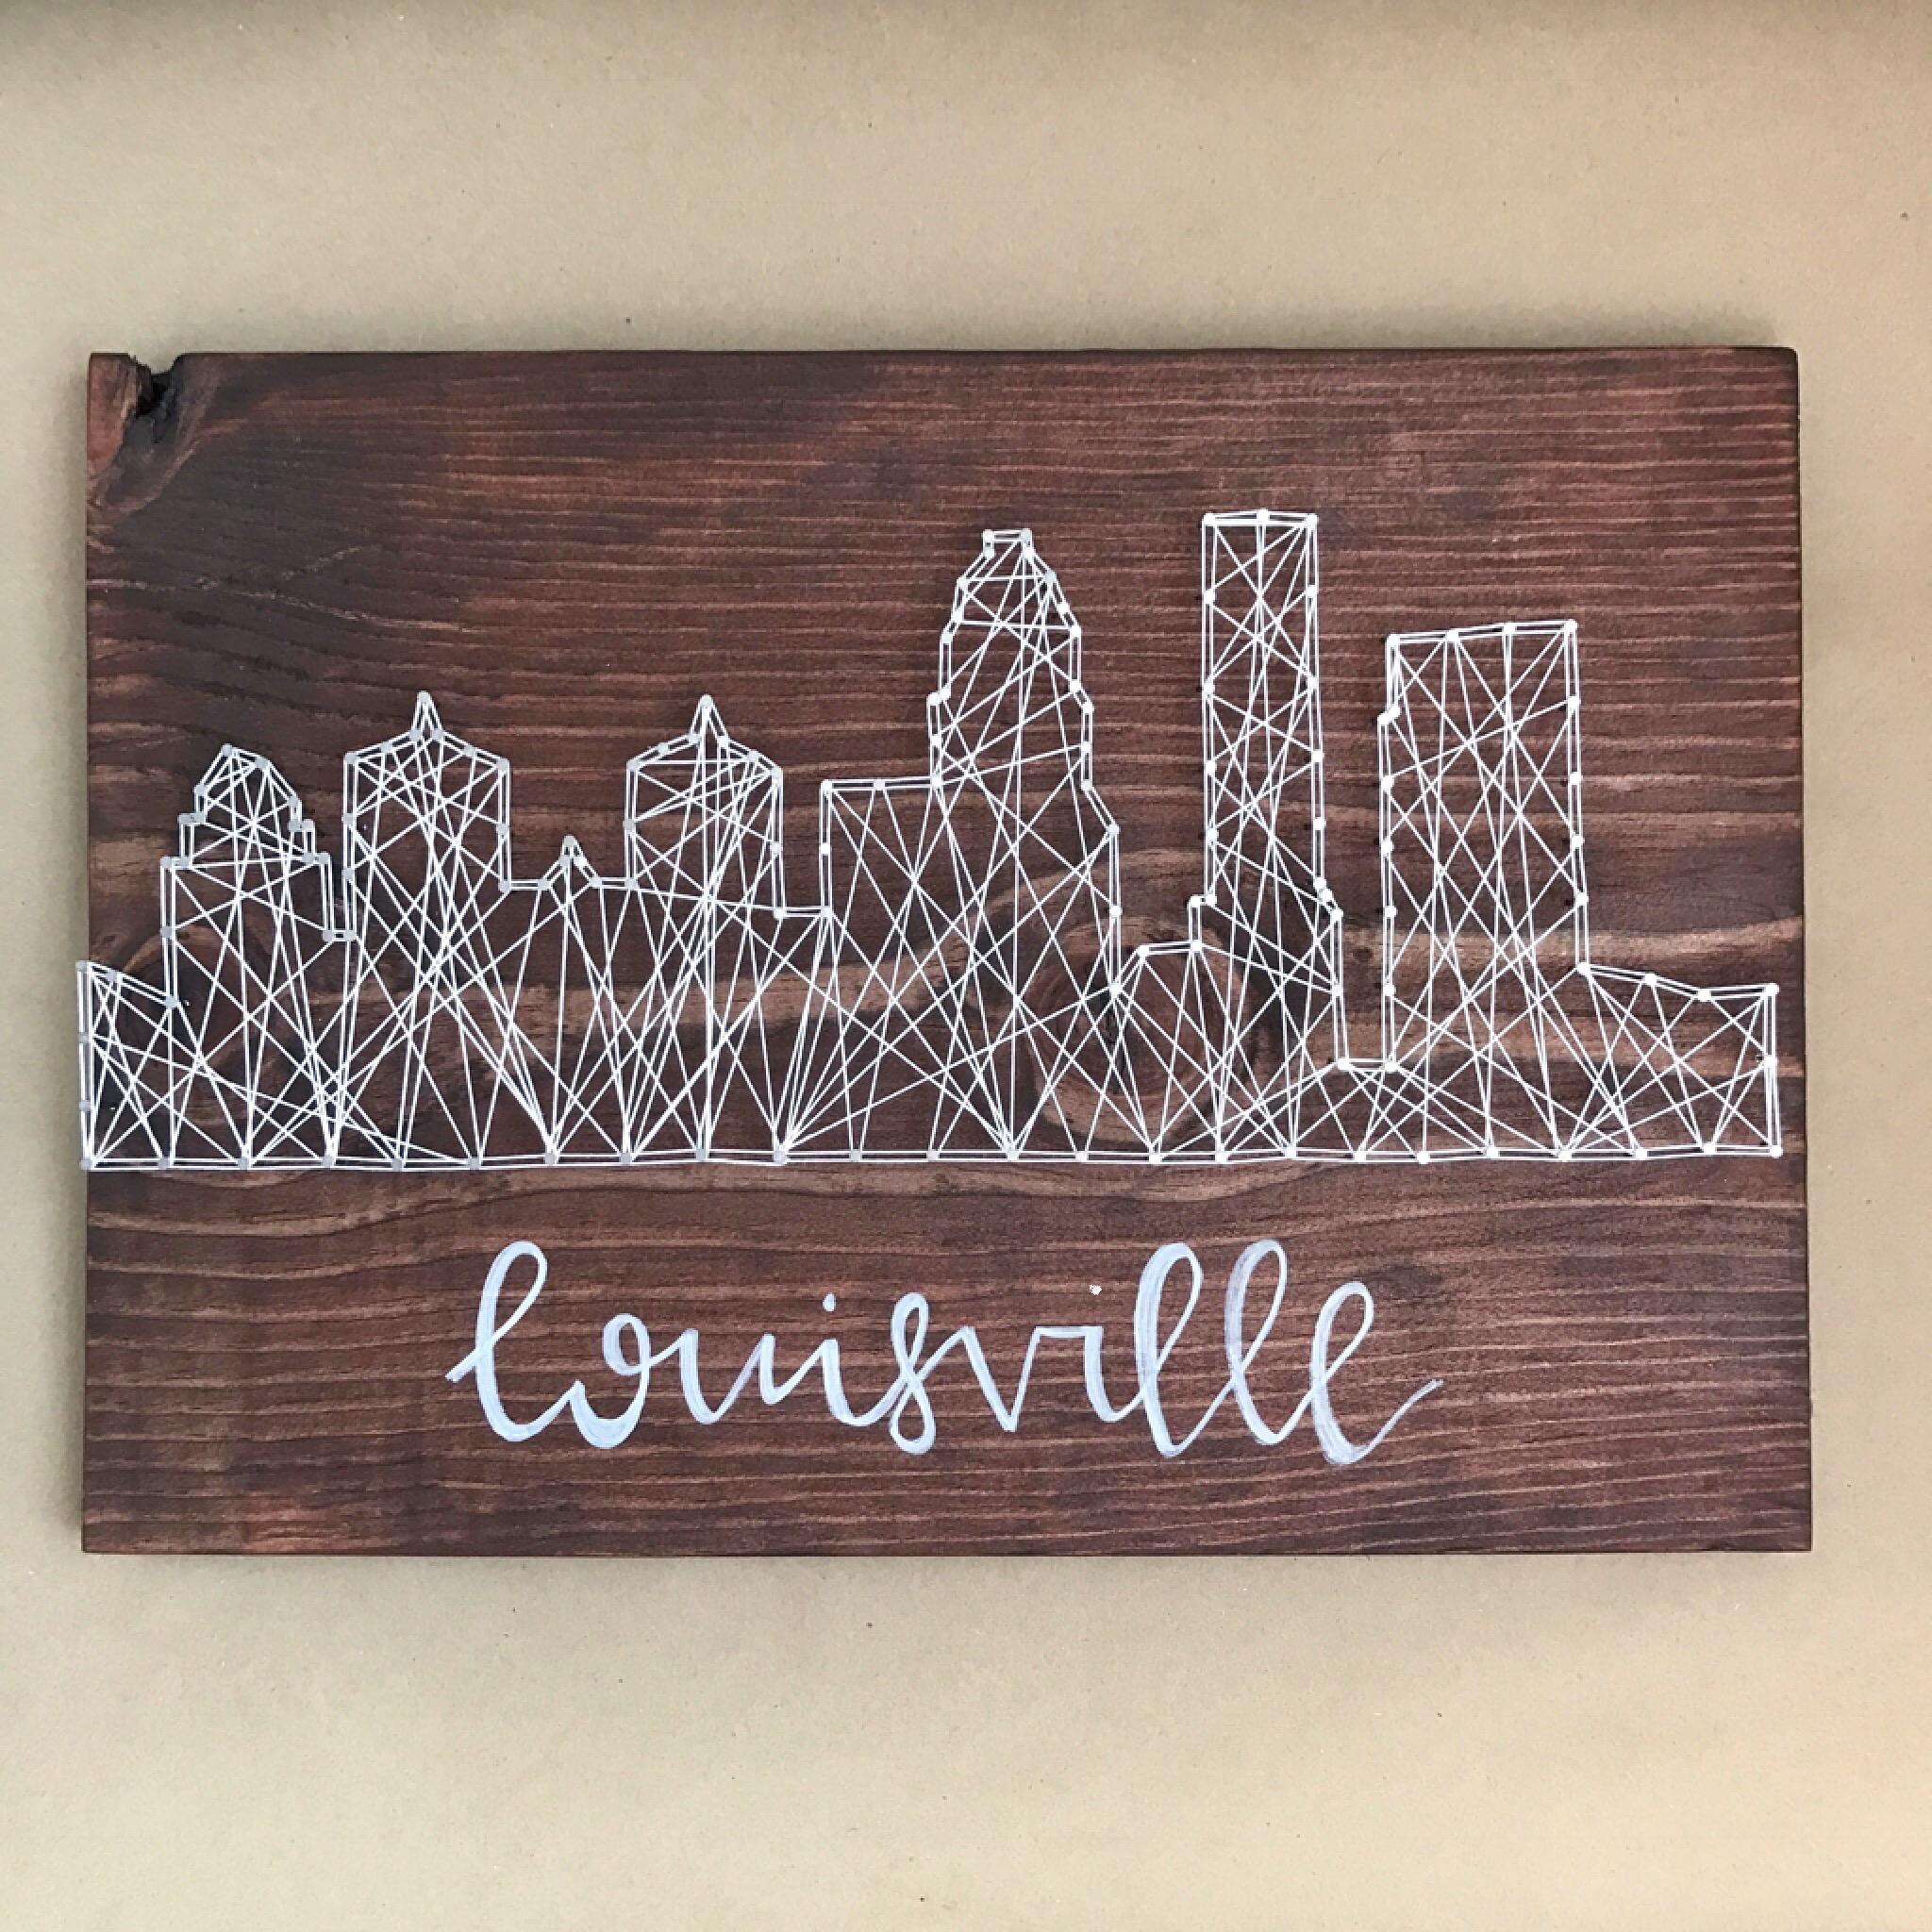 """Louisville Skyline"" by Wood & Twine, 16x12in, wood, string (2016), $75 | BUY NOW"